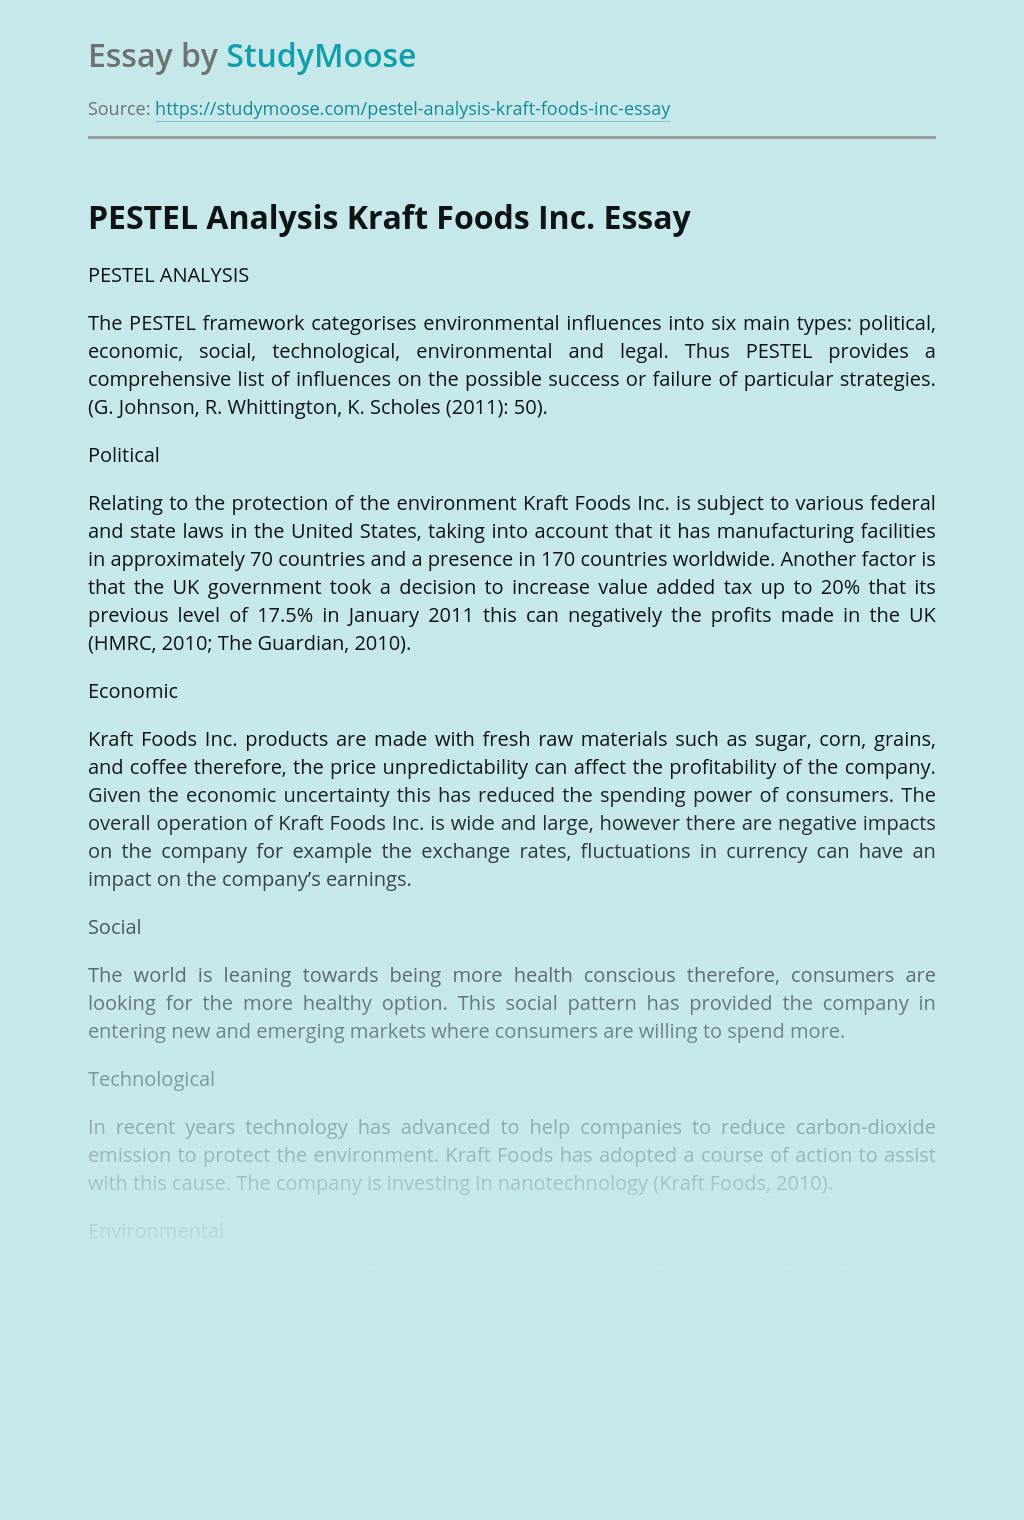 PESTEL Analysis Kraft Foods Inc.